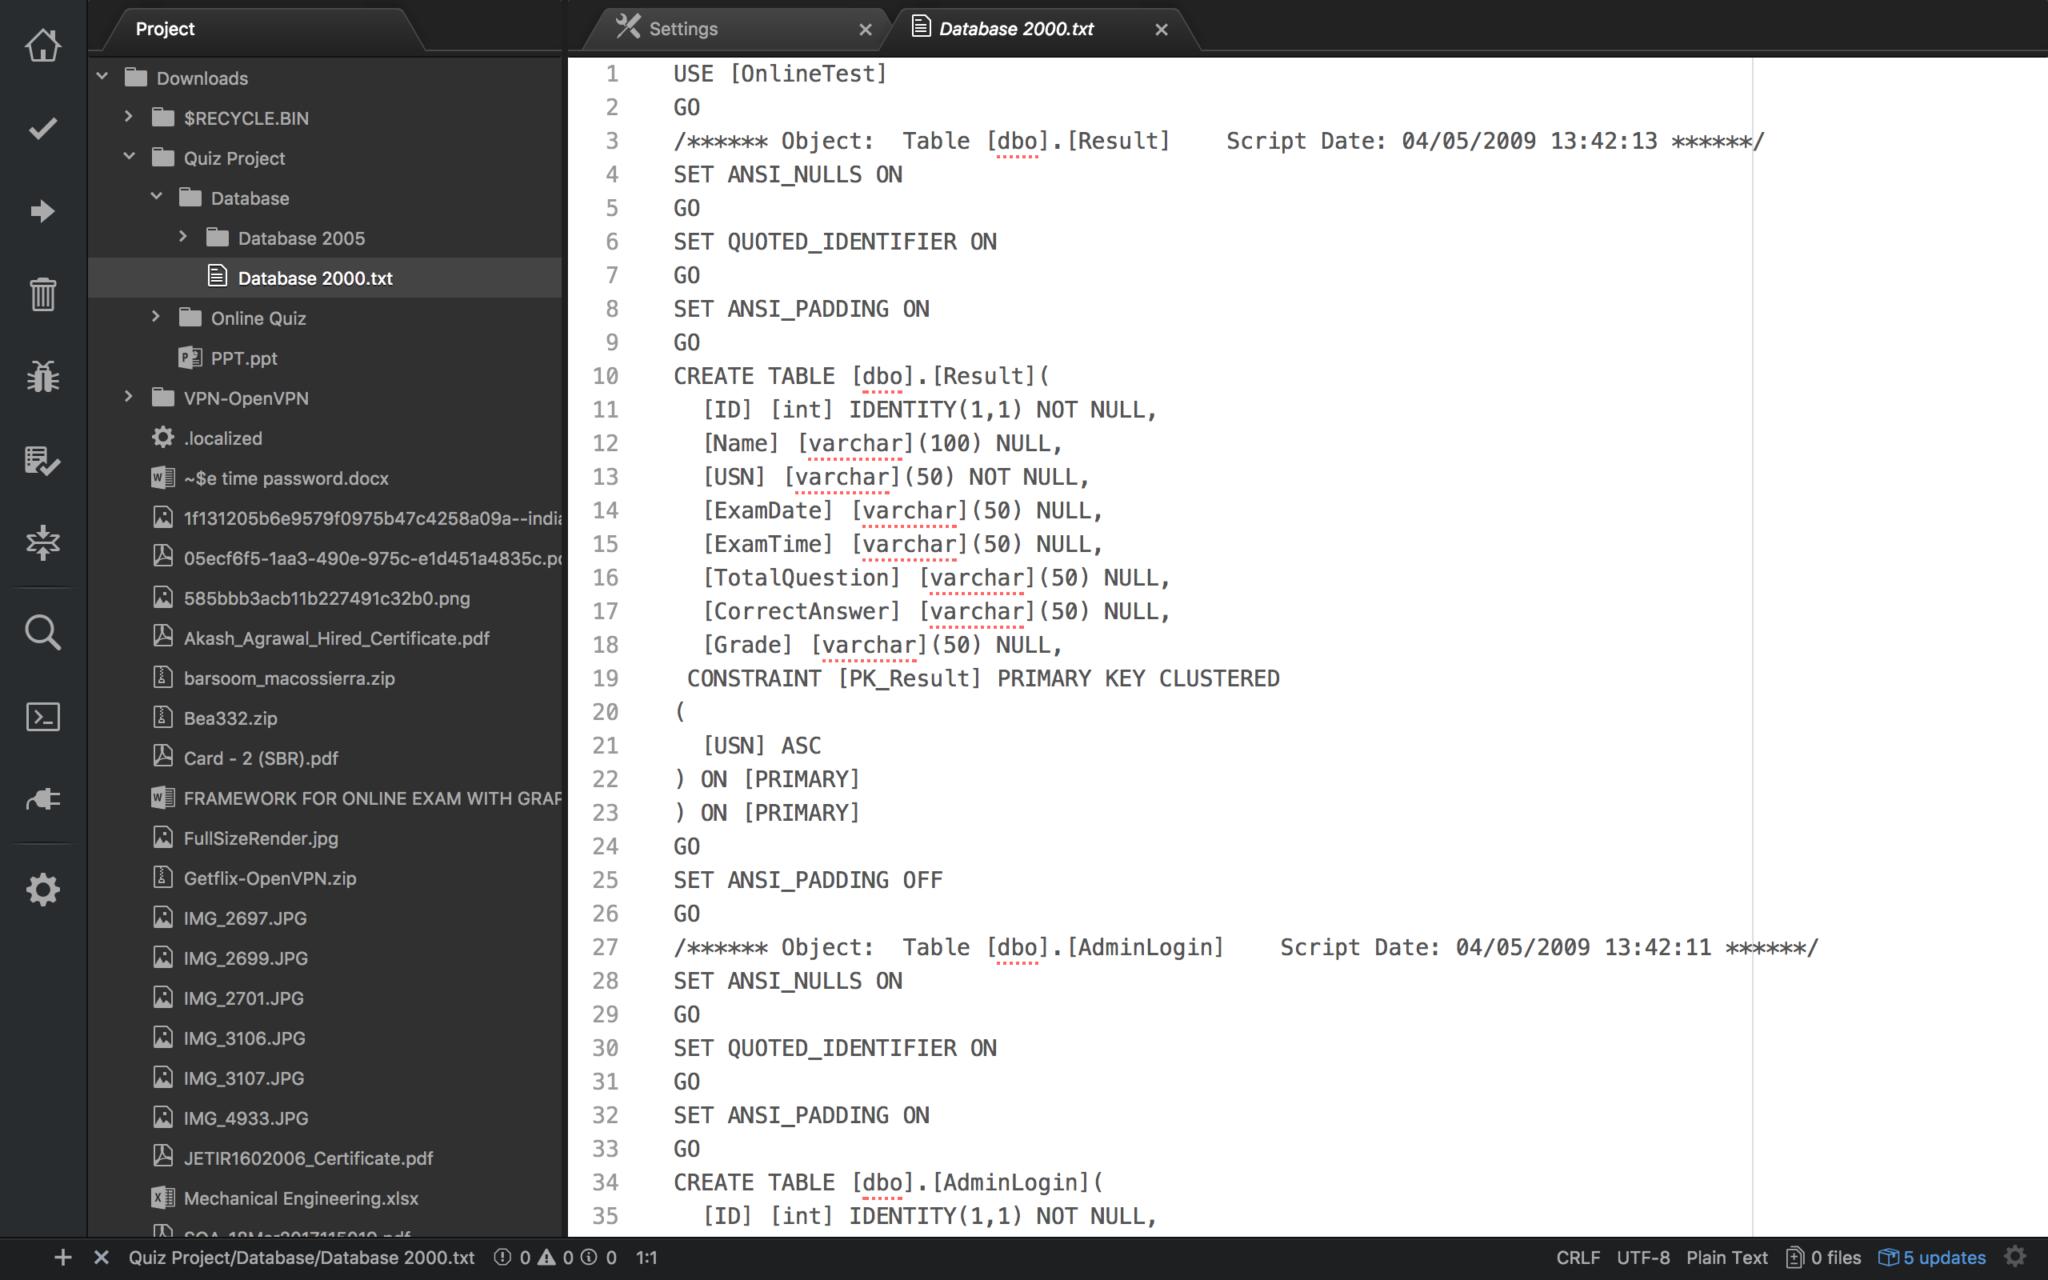 Atom - text editor for Mac